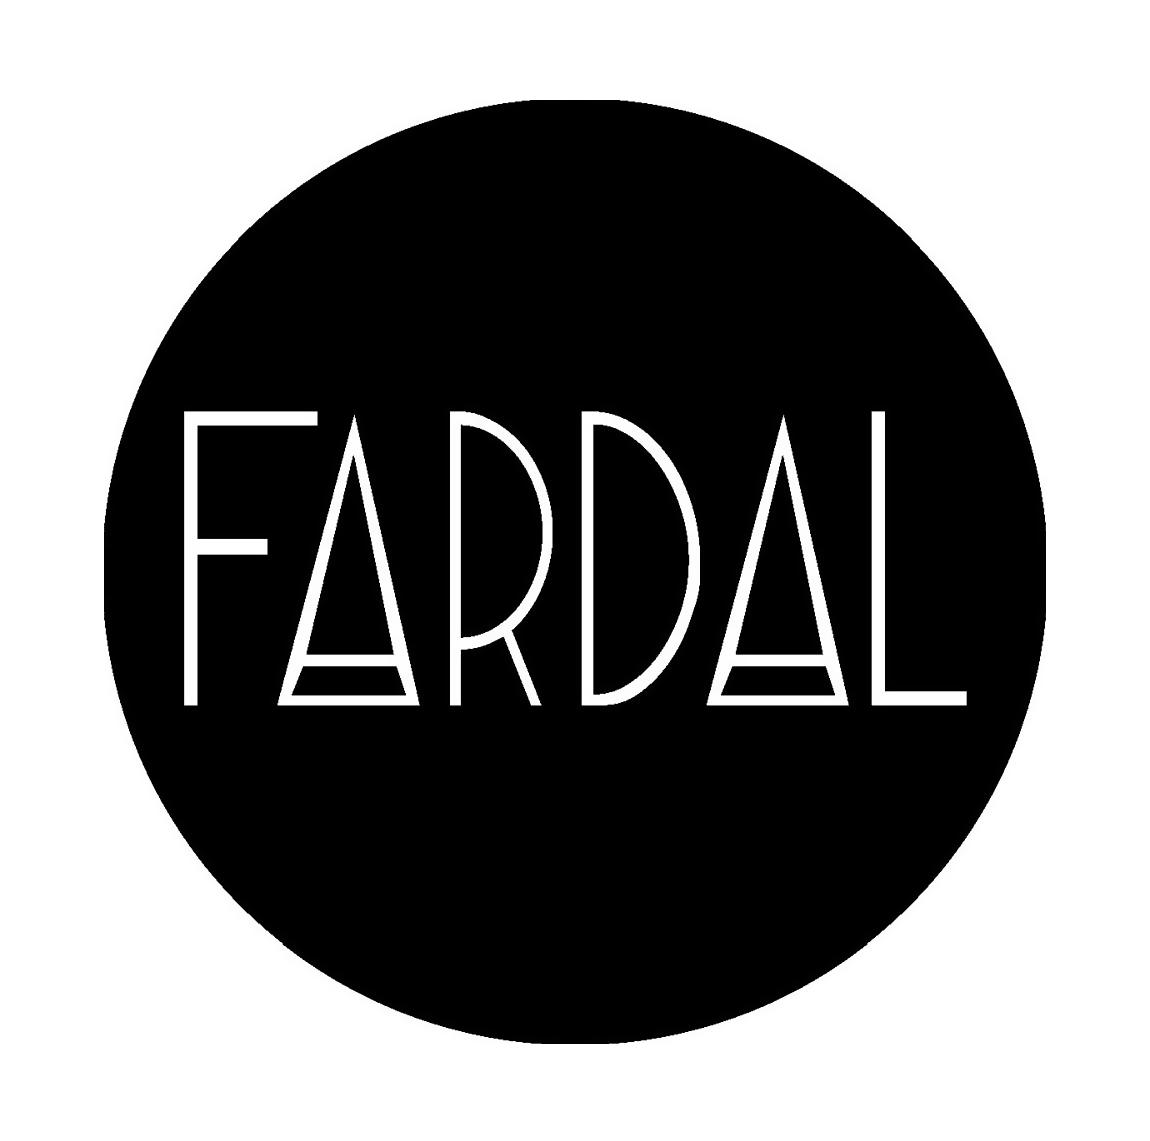 fardal-logo-fra-facebook.png